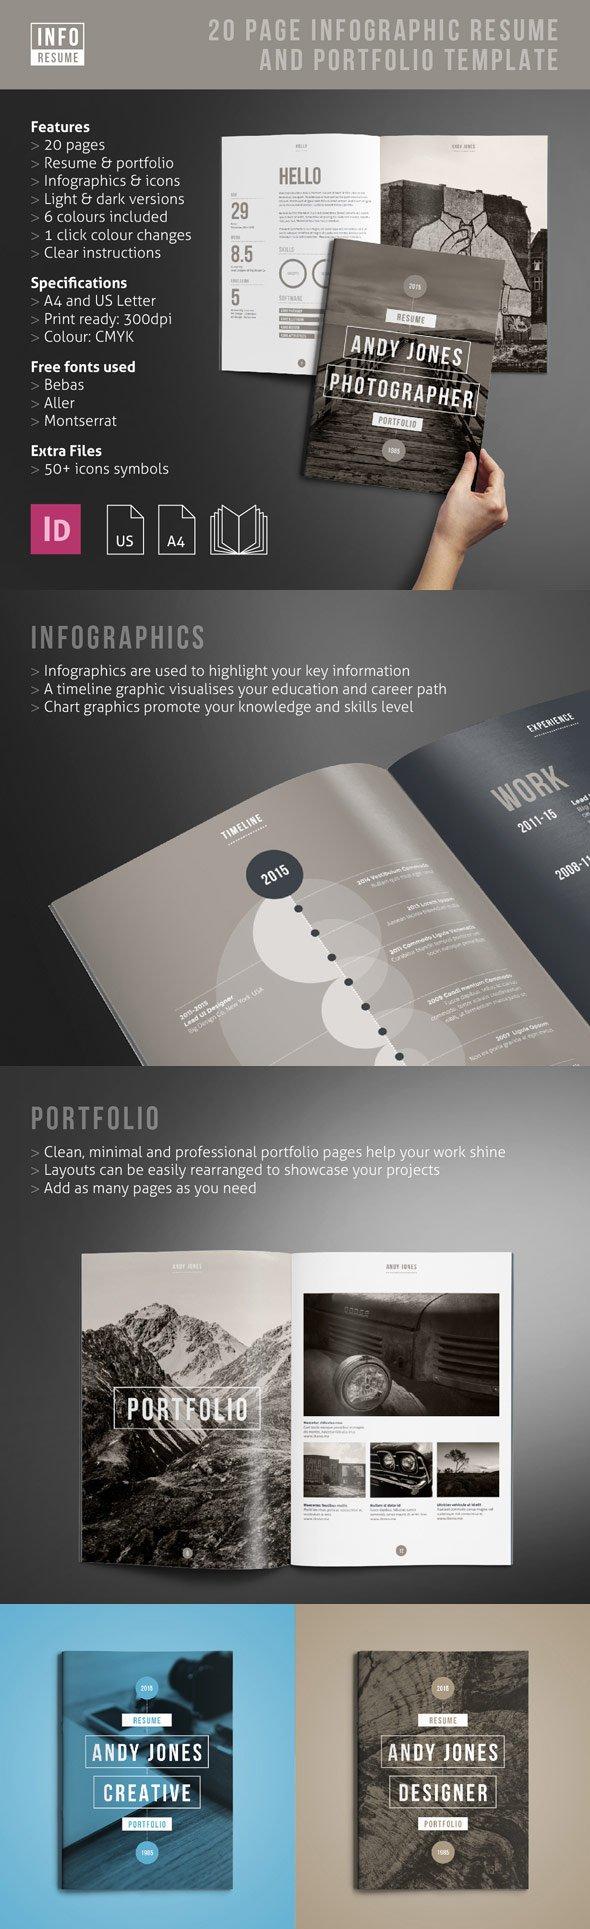 Infographic Resume and Portfolio Set